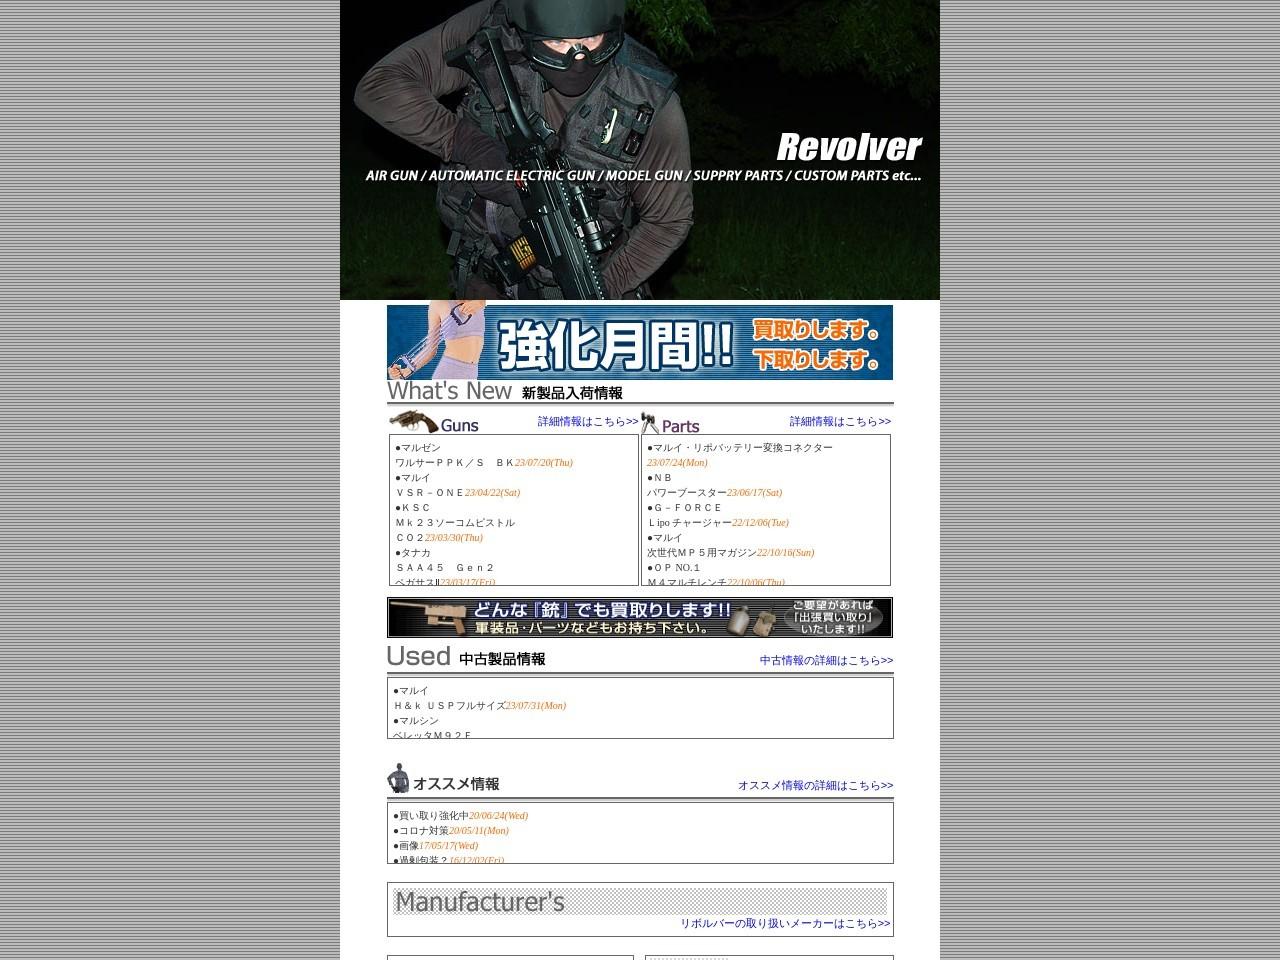 REVOLVER-エアガン専門店リボルバー~エアガン、電動ガン、モデルガン、パーツ、サバイバルゲーム